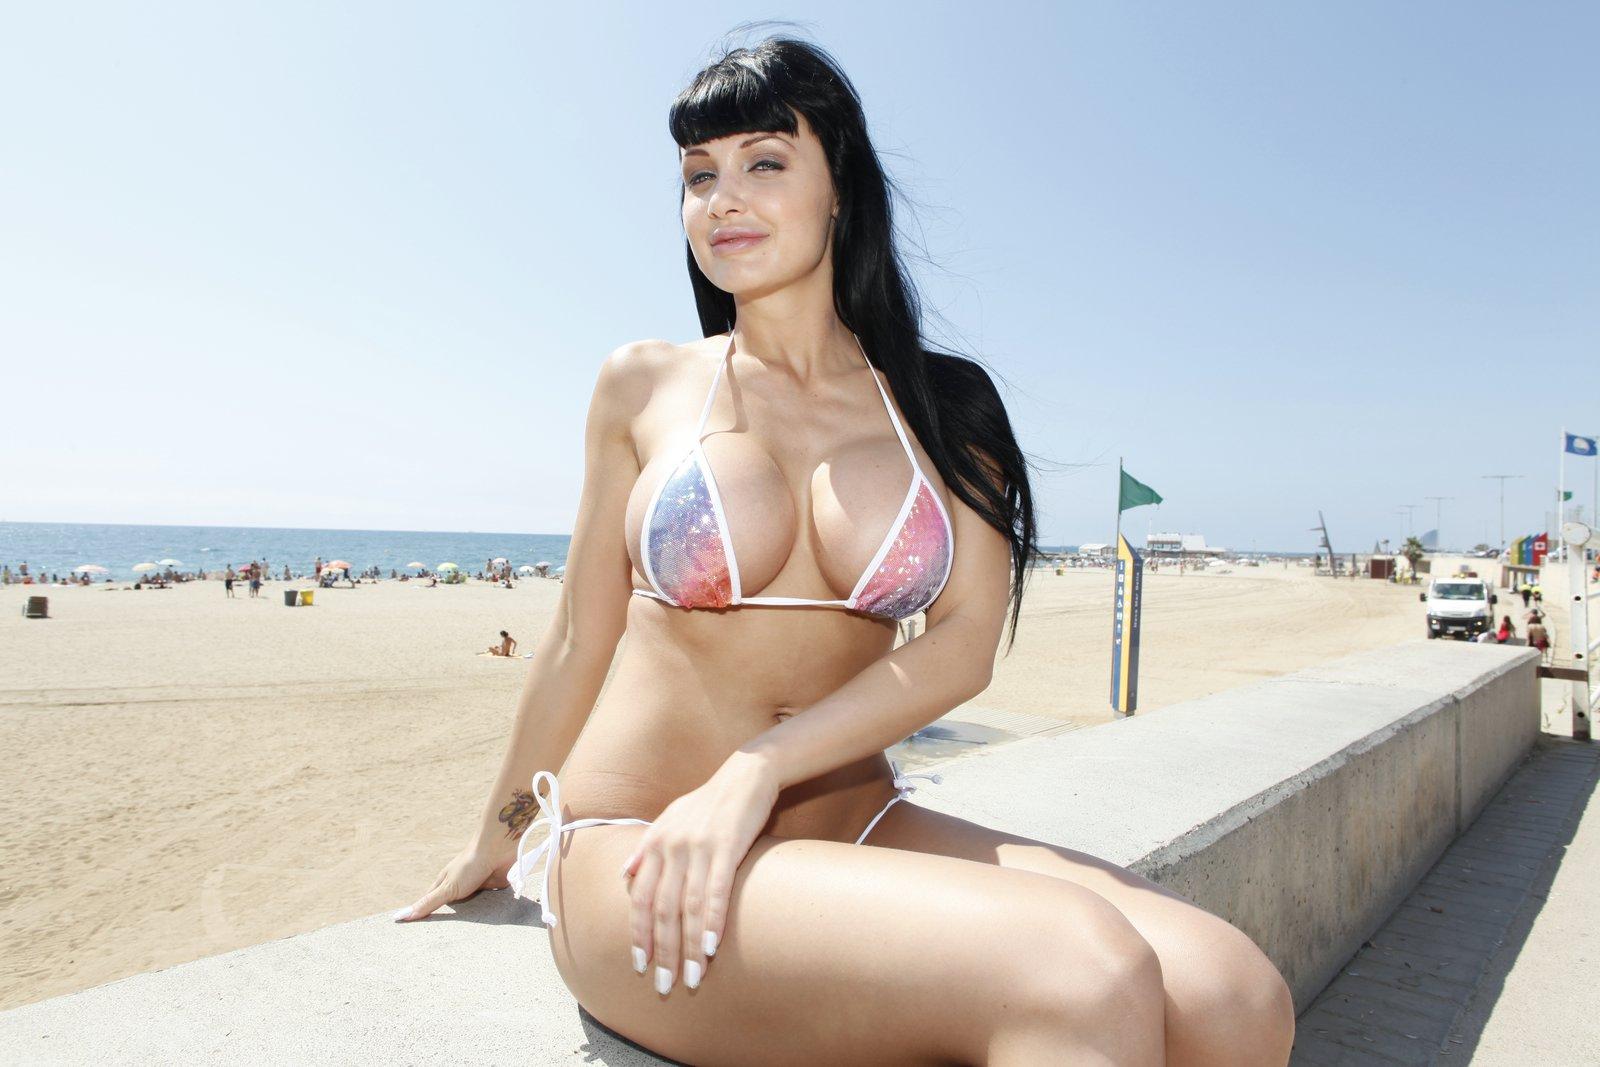 Reserve Bikini girl get fucked think